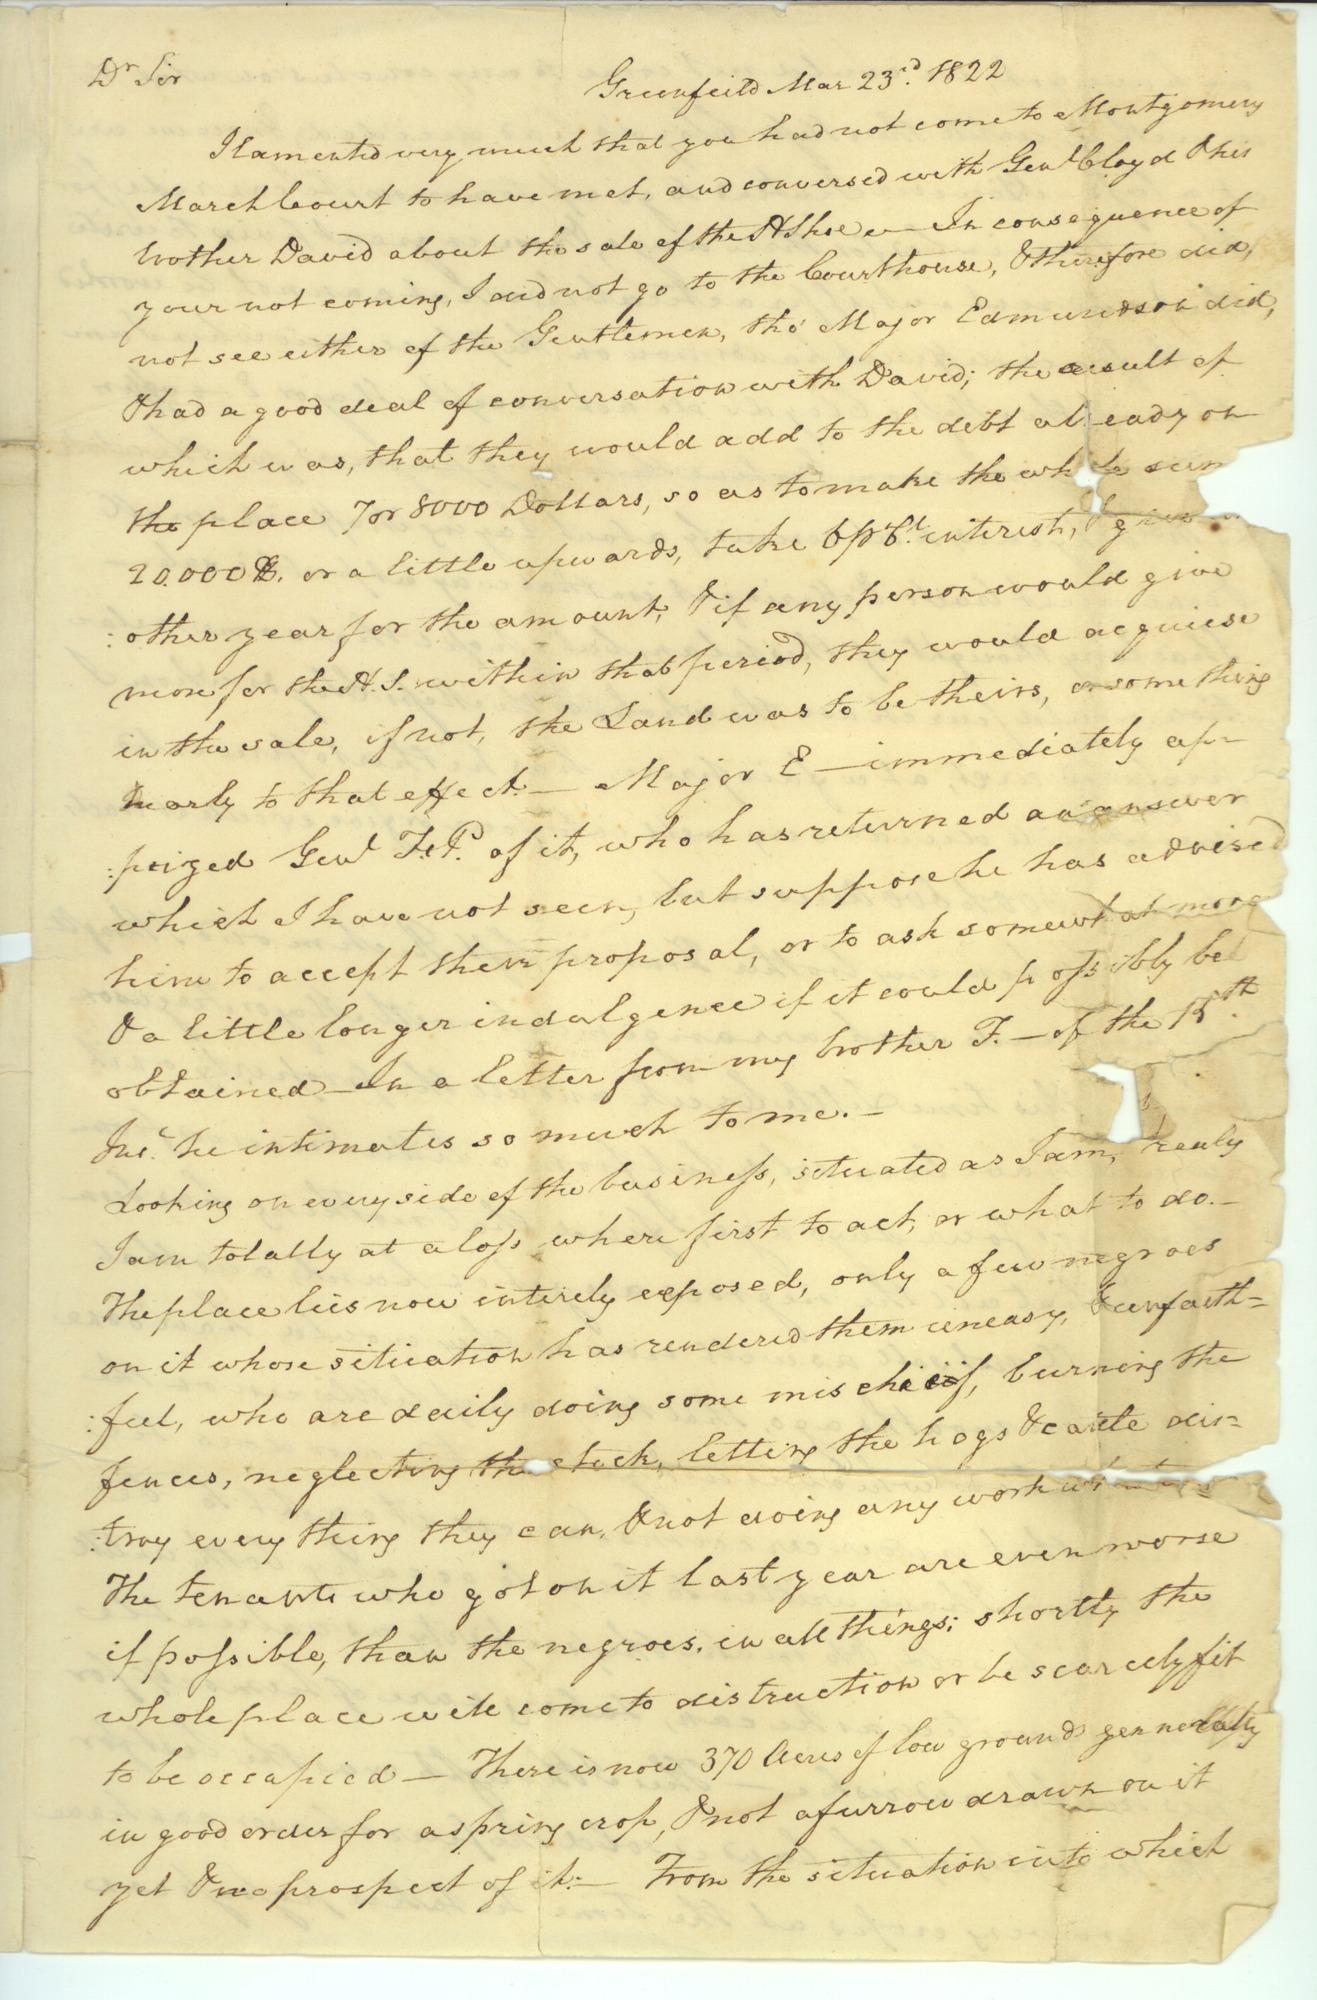 Ms1997_002_SmithfieldPreston_Letter_1822_0323a.jpg